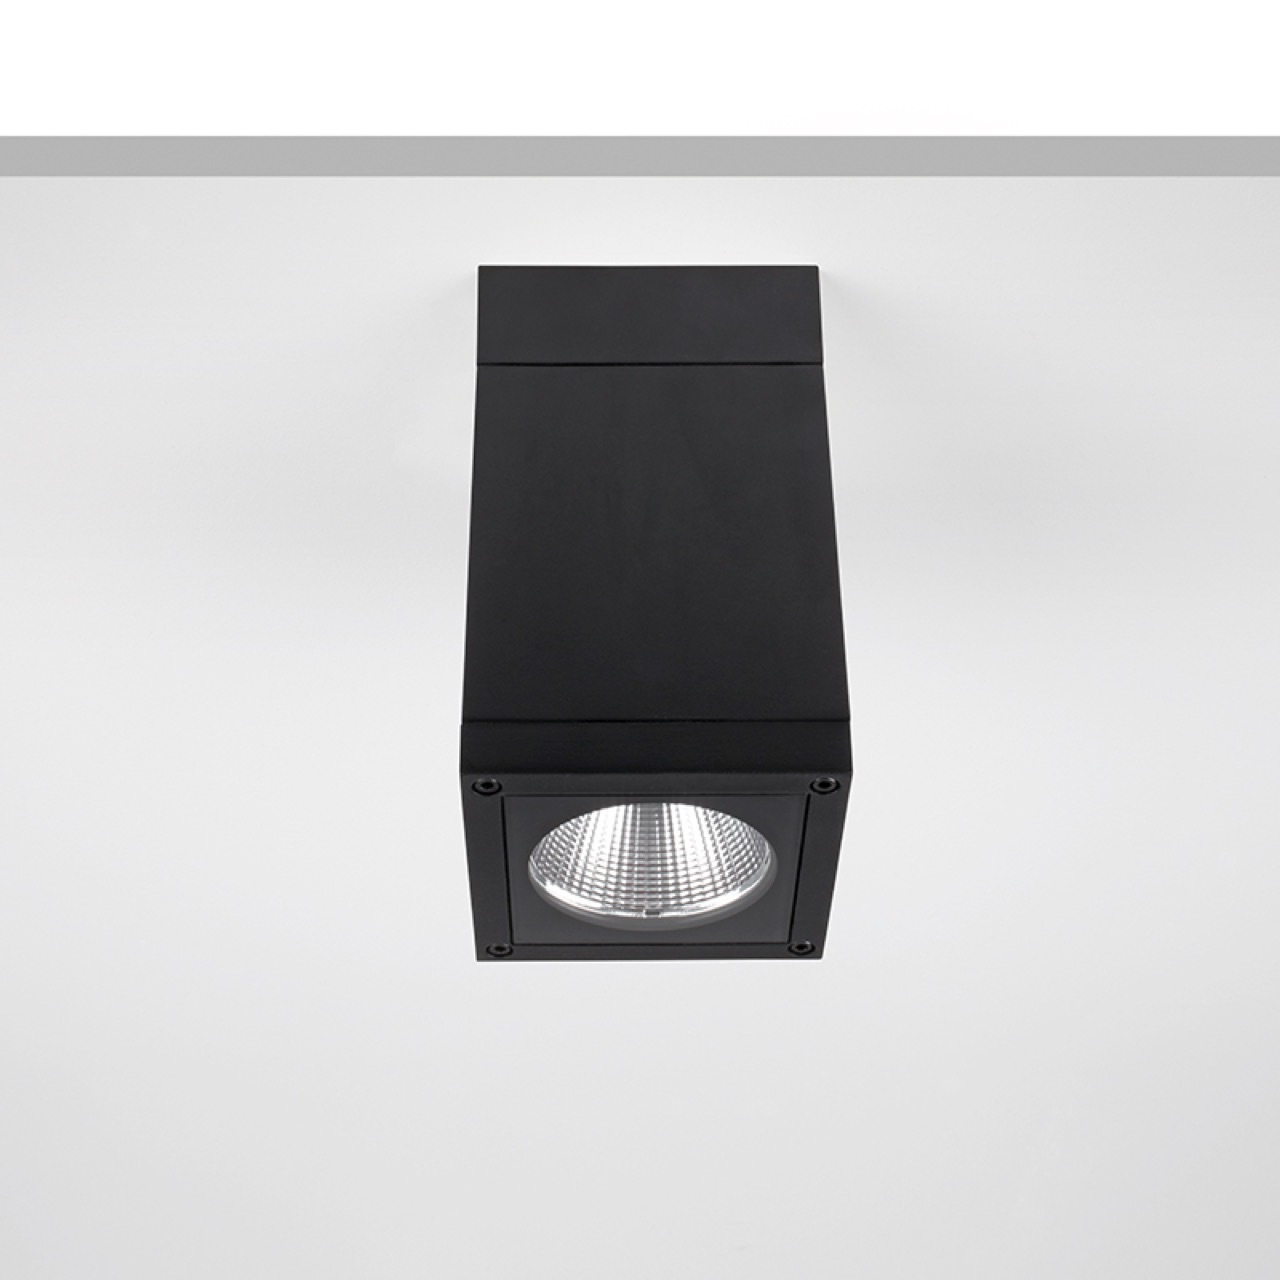 Cubo 18 Square von PROLED in schwarz